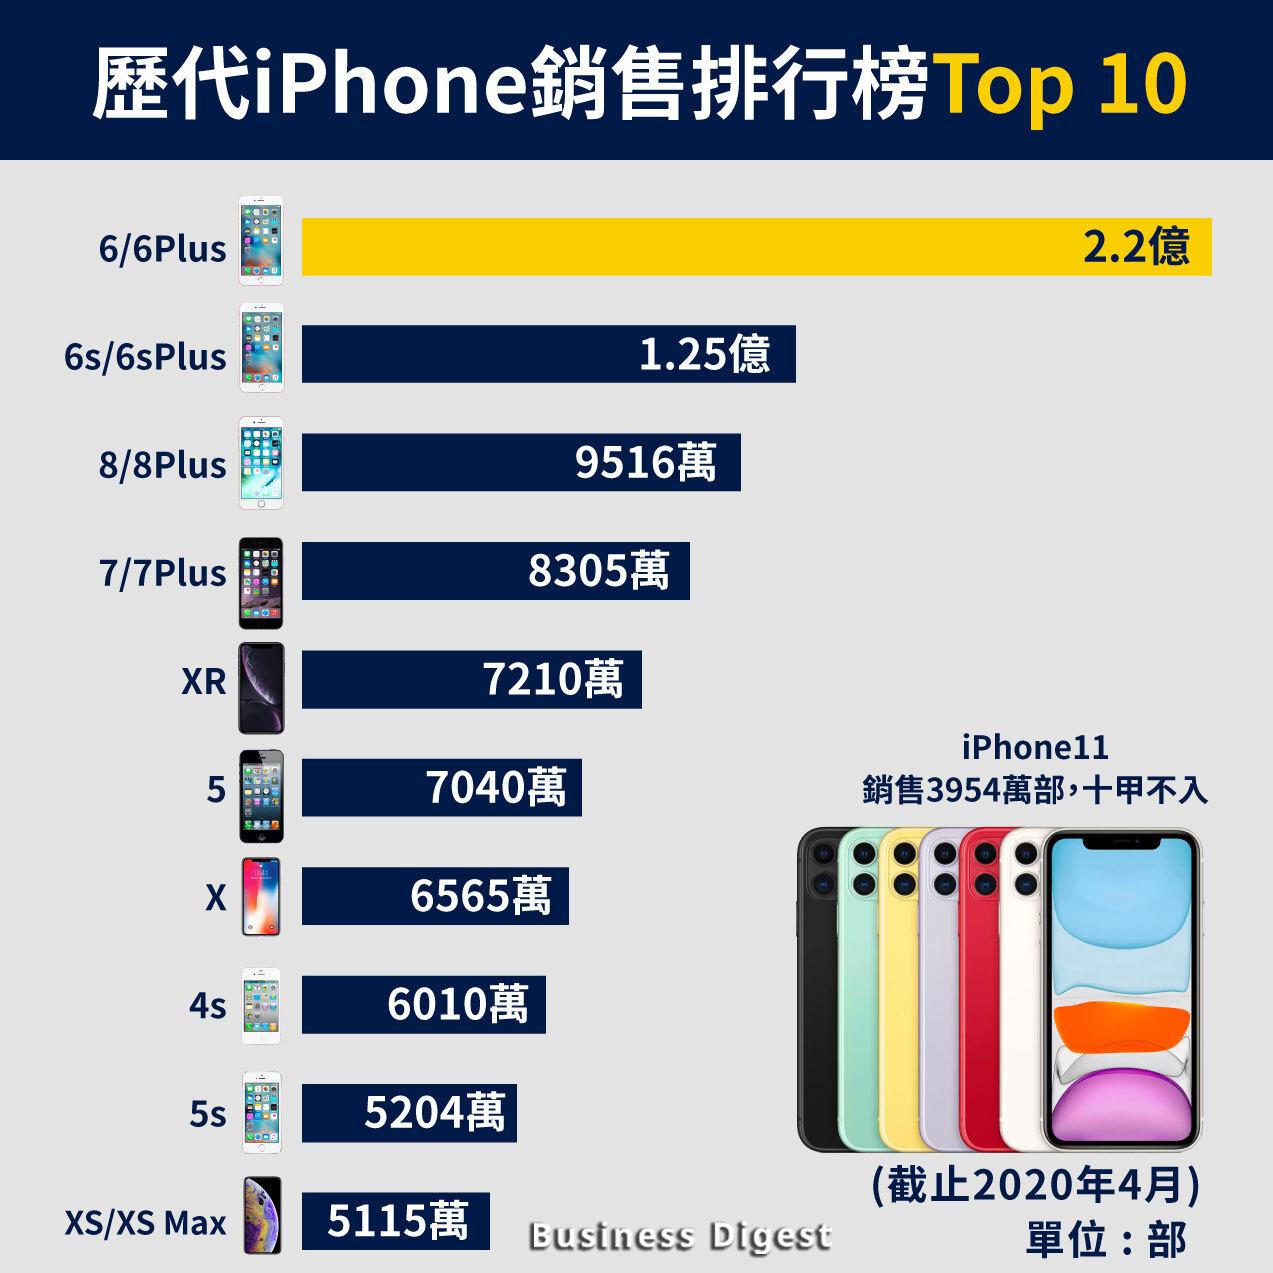 iPhone 6系列是銷售量最多的iPhone,截止2020年4月錄得銷售總量達2.22億部,較銷售量排名第二名的iPhone 6s系列多出近1億部